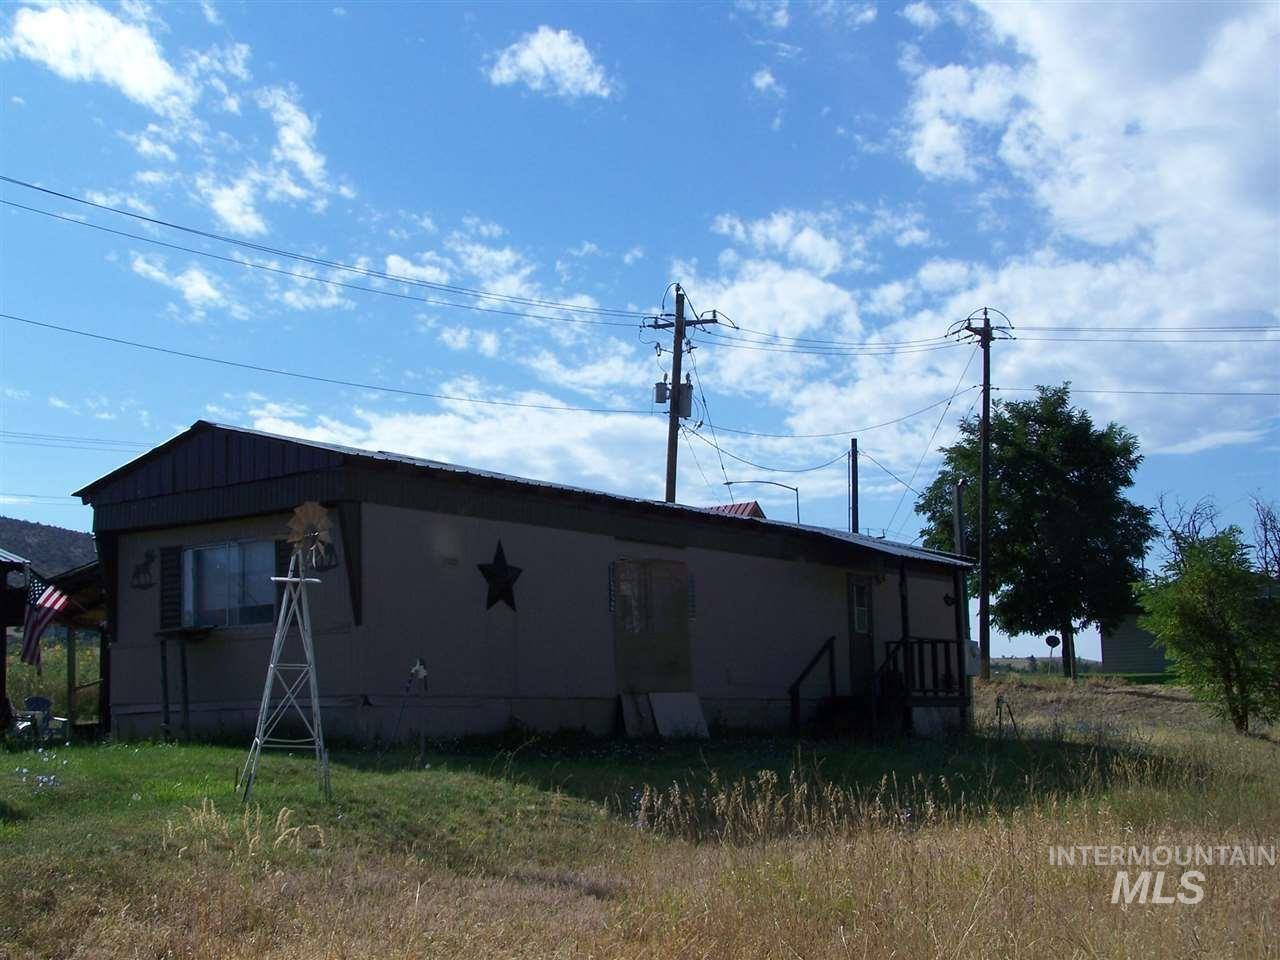 307 California Ave, Council, ID 83612 - MLS#: 98771584